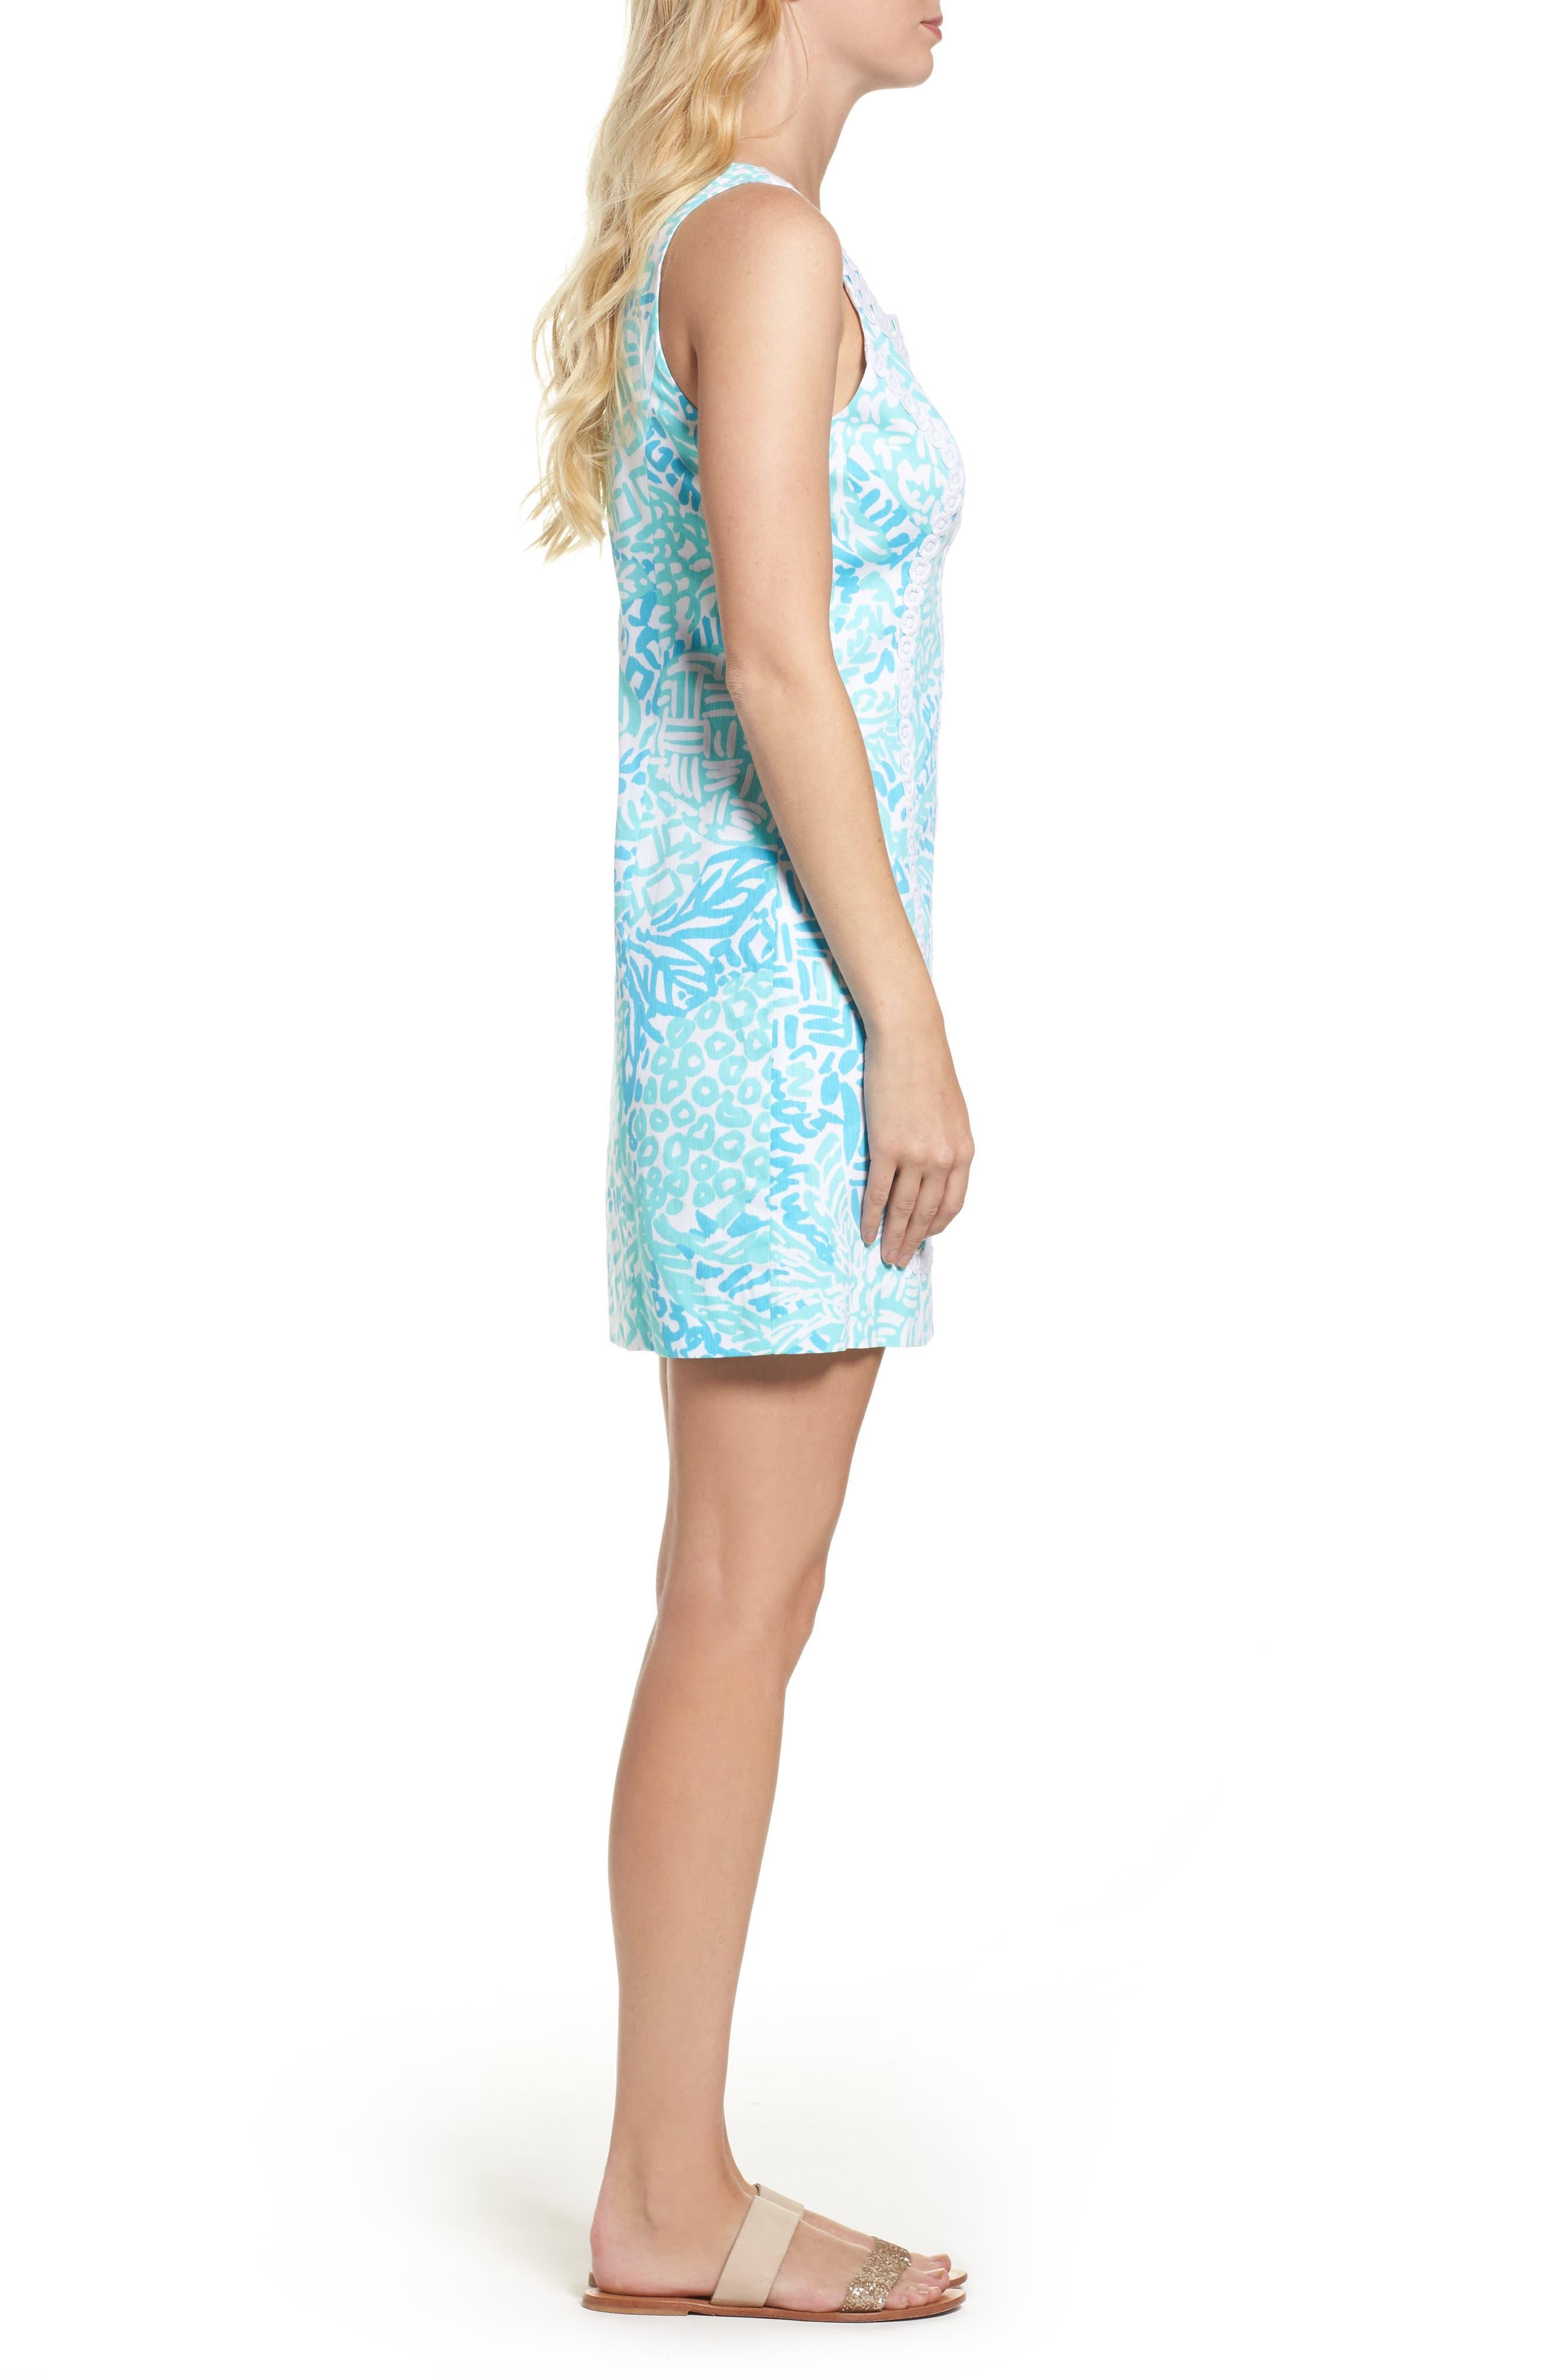 McFarlane Sheath dress,                             Alternate thumbnail 3, color,                             436